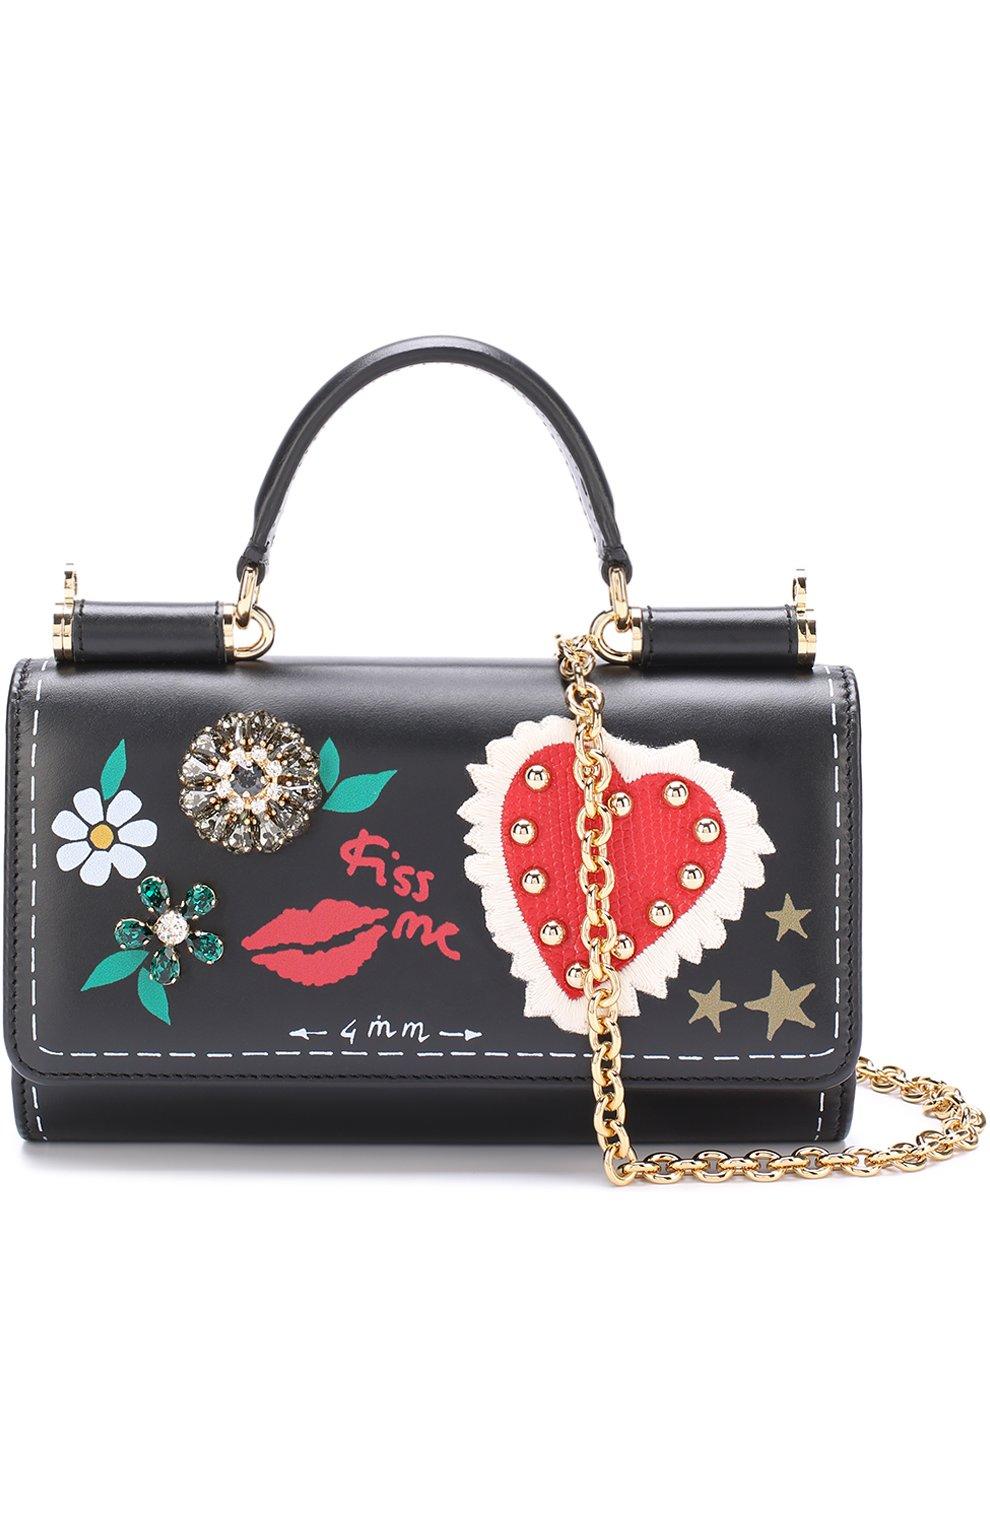 Кожаный чехол для iPhone 7 Plus на цепочке Dolce & Gabbana  | Фото №4